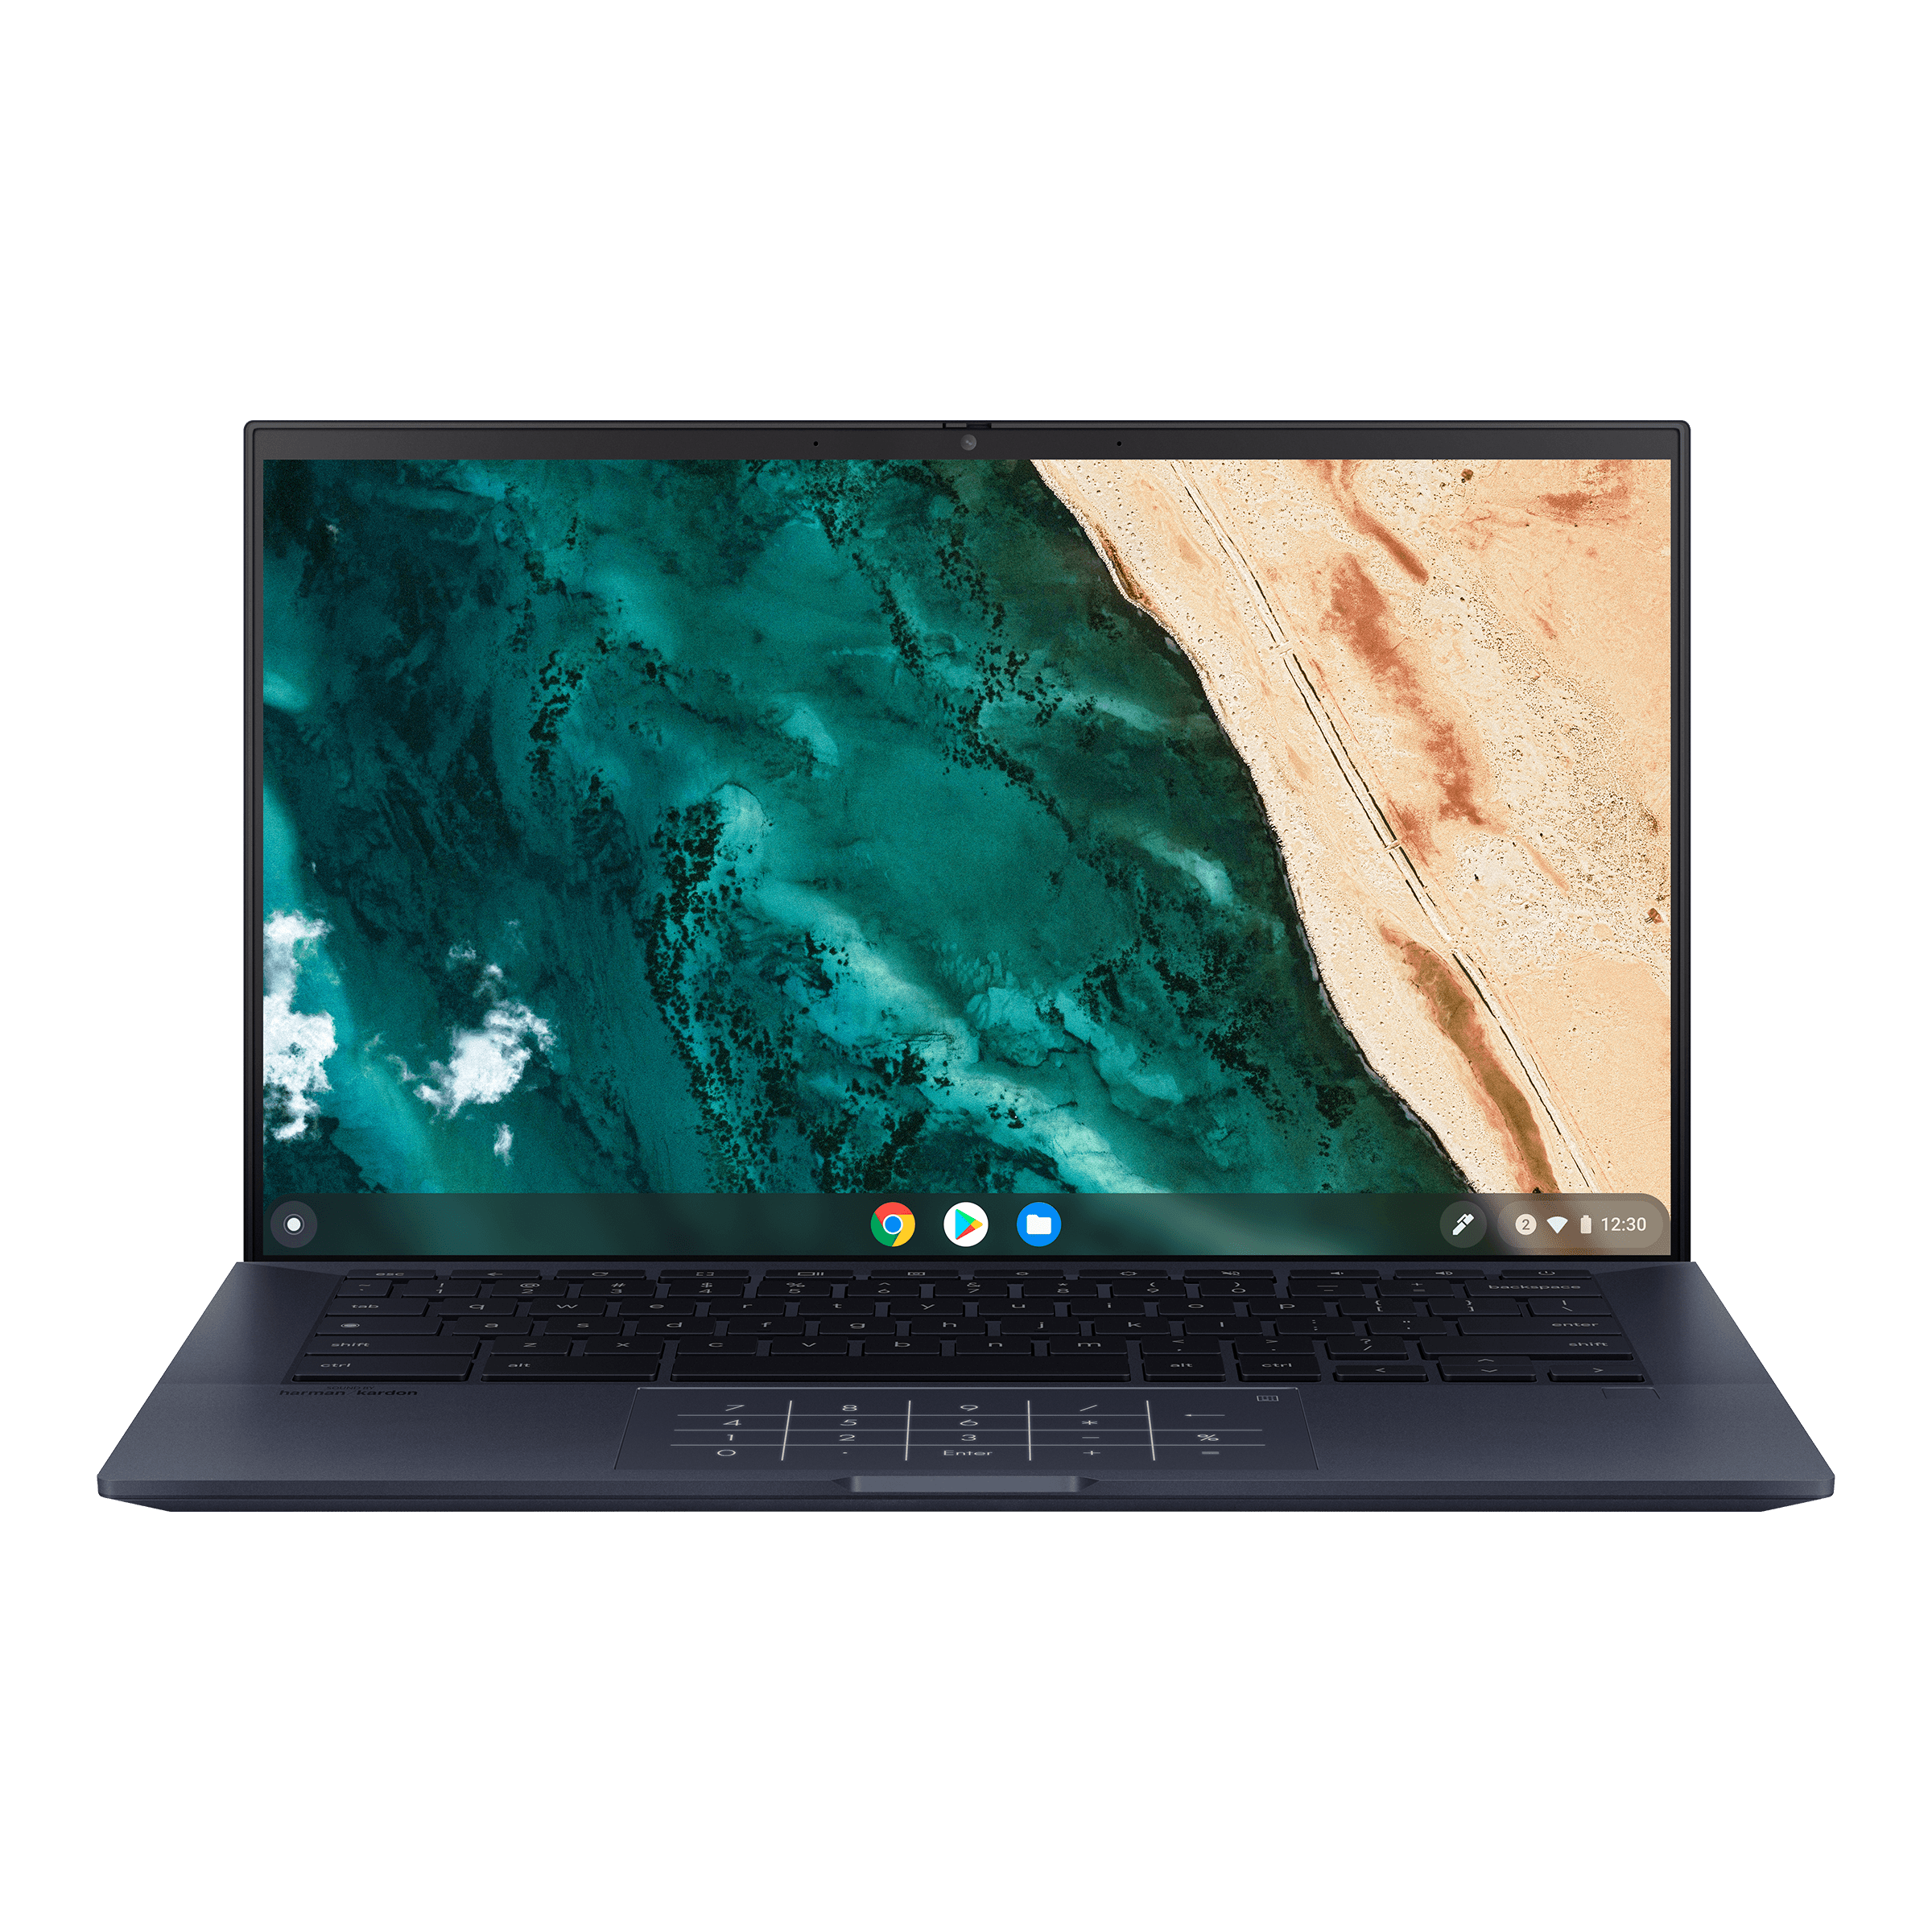 ASUS Chromebook CX9 (CX9400, 11th Gen Intel)